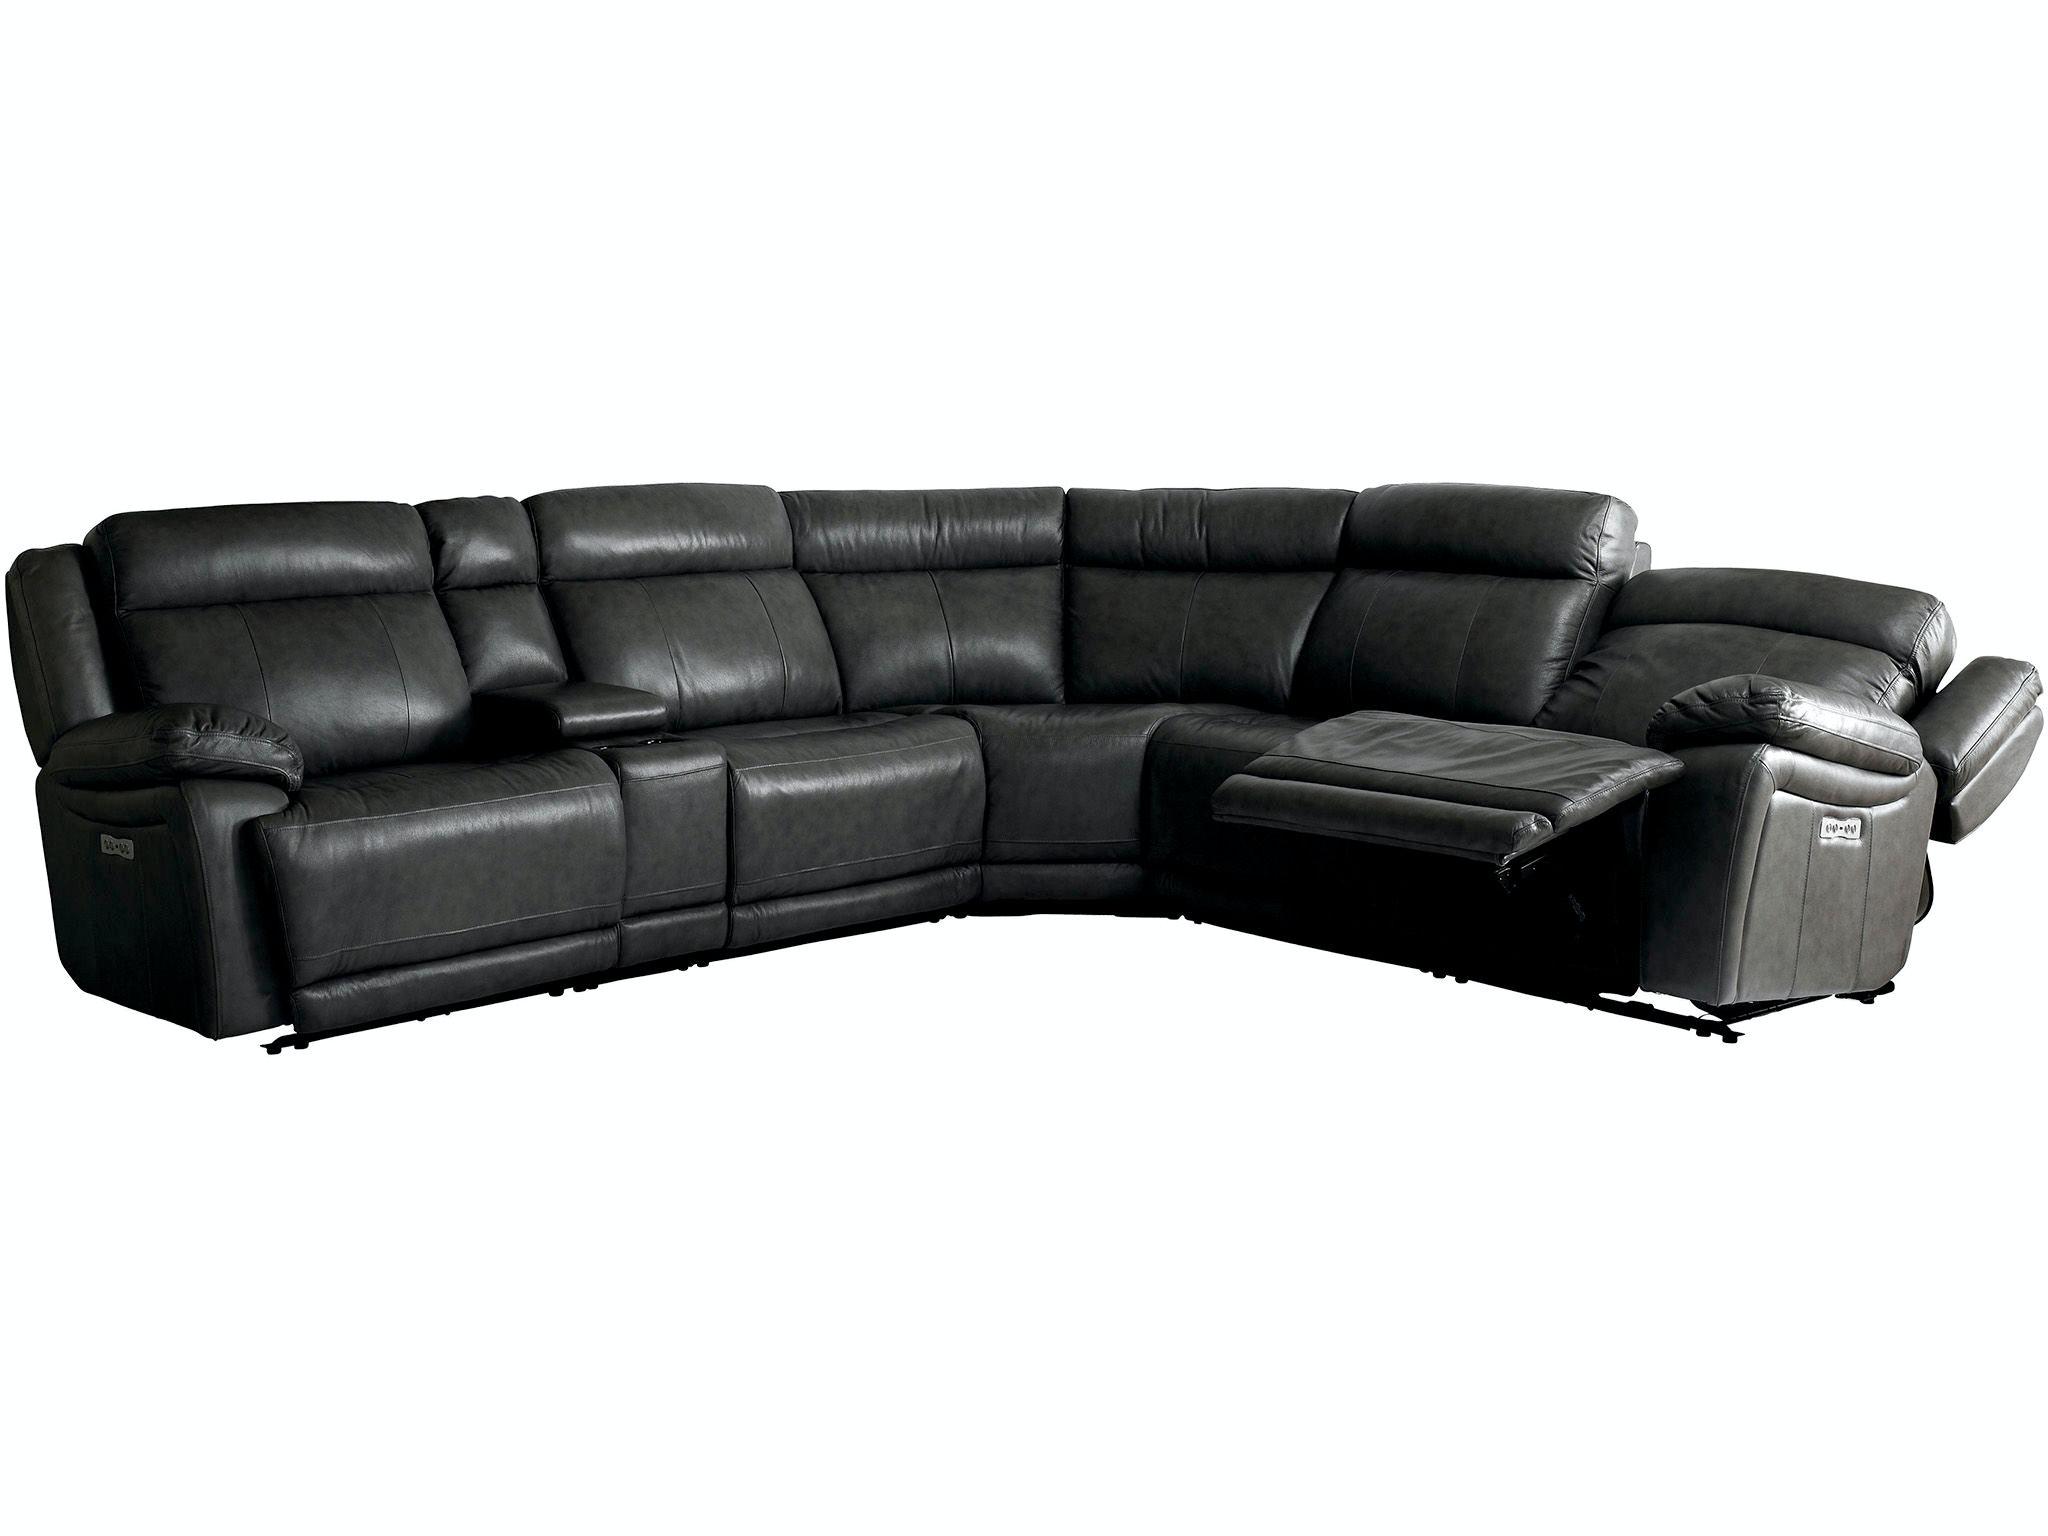 bassett living room sofa w  power 3706 p62g kalin home